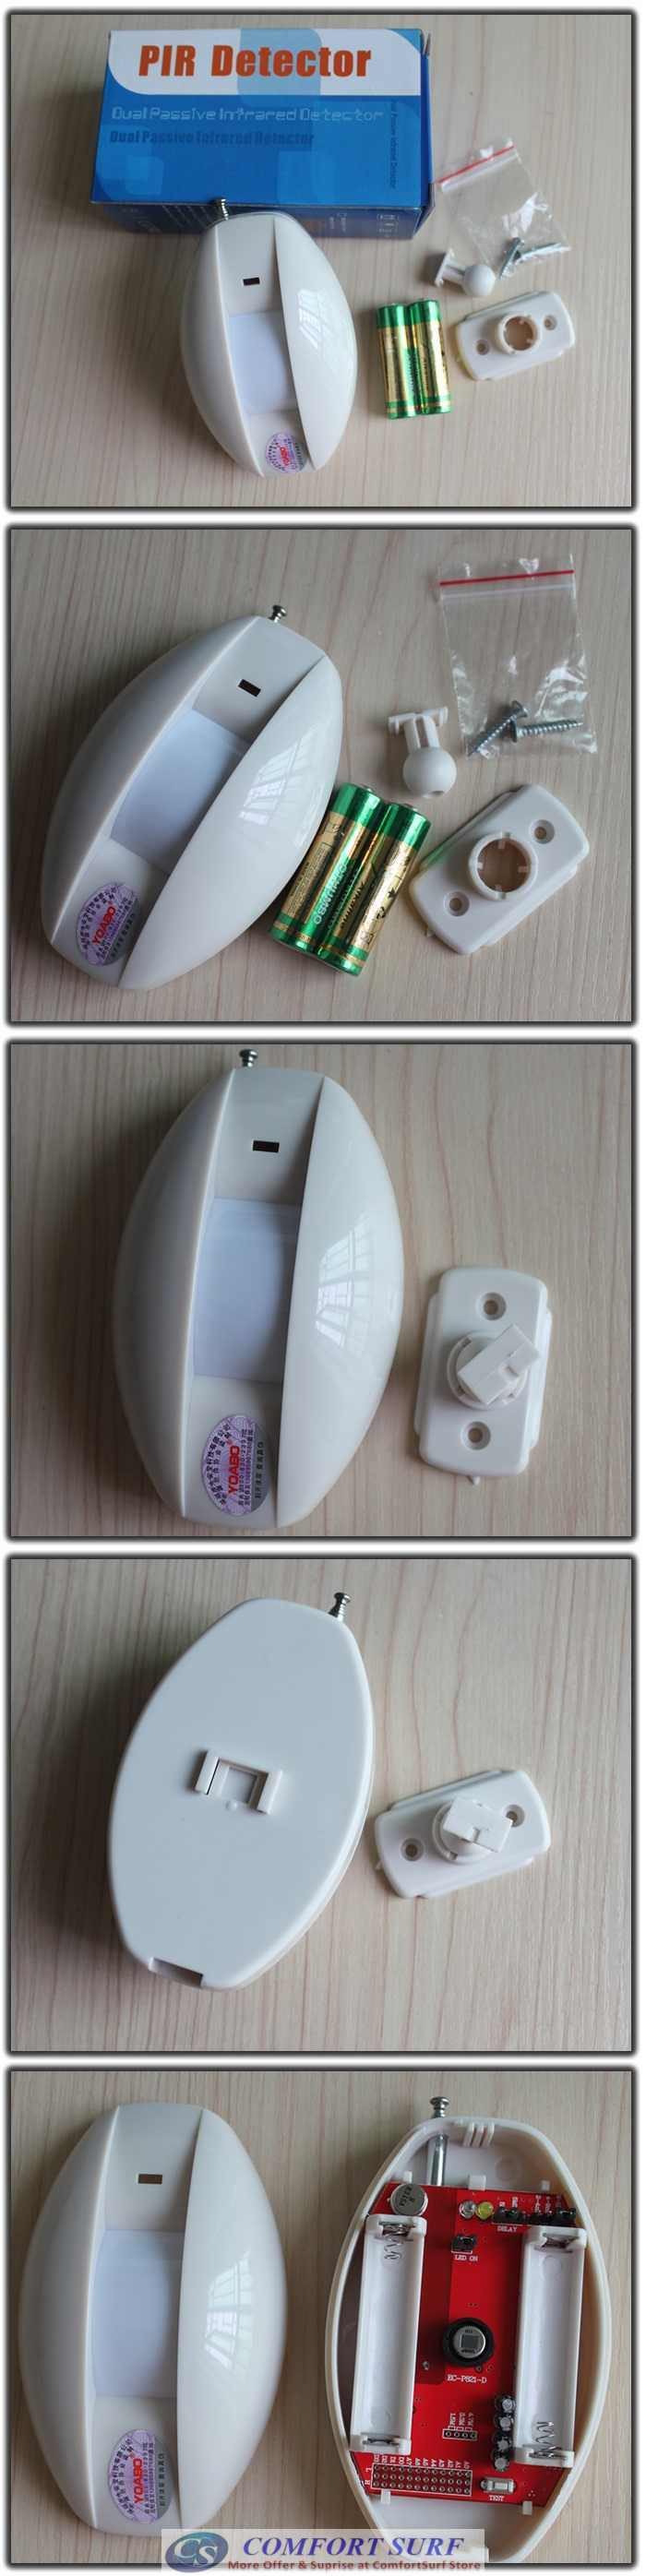 Window Curtain PIR Infrared Detector Motion Sensor for Home Burglar Alarm Aystem